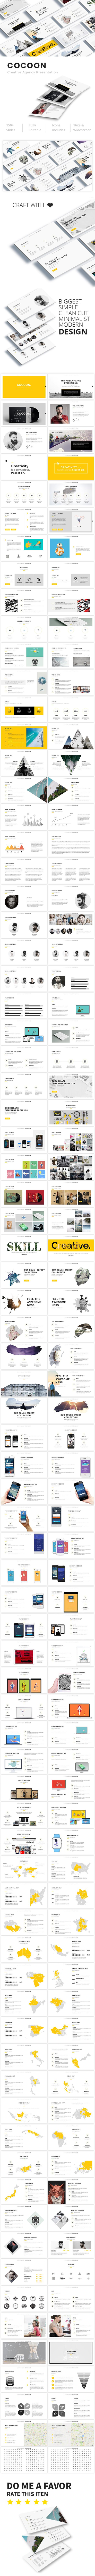 Cocoon - Creative Google Slide Template - Google Slides Presentation Templates